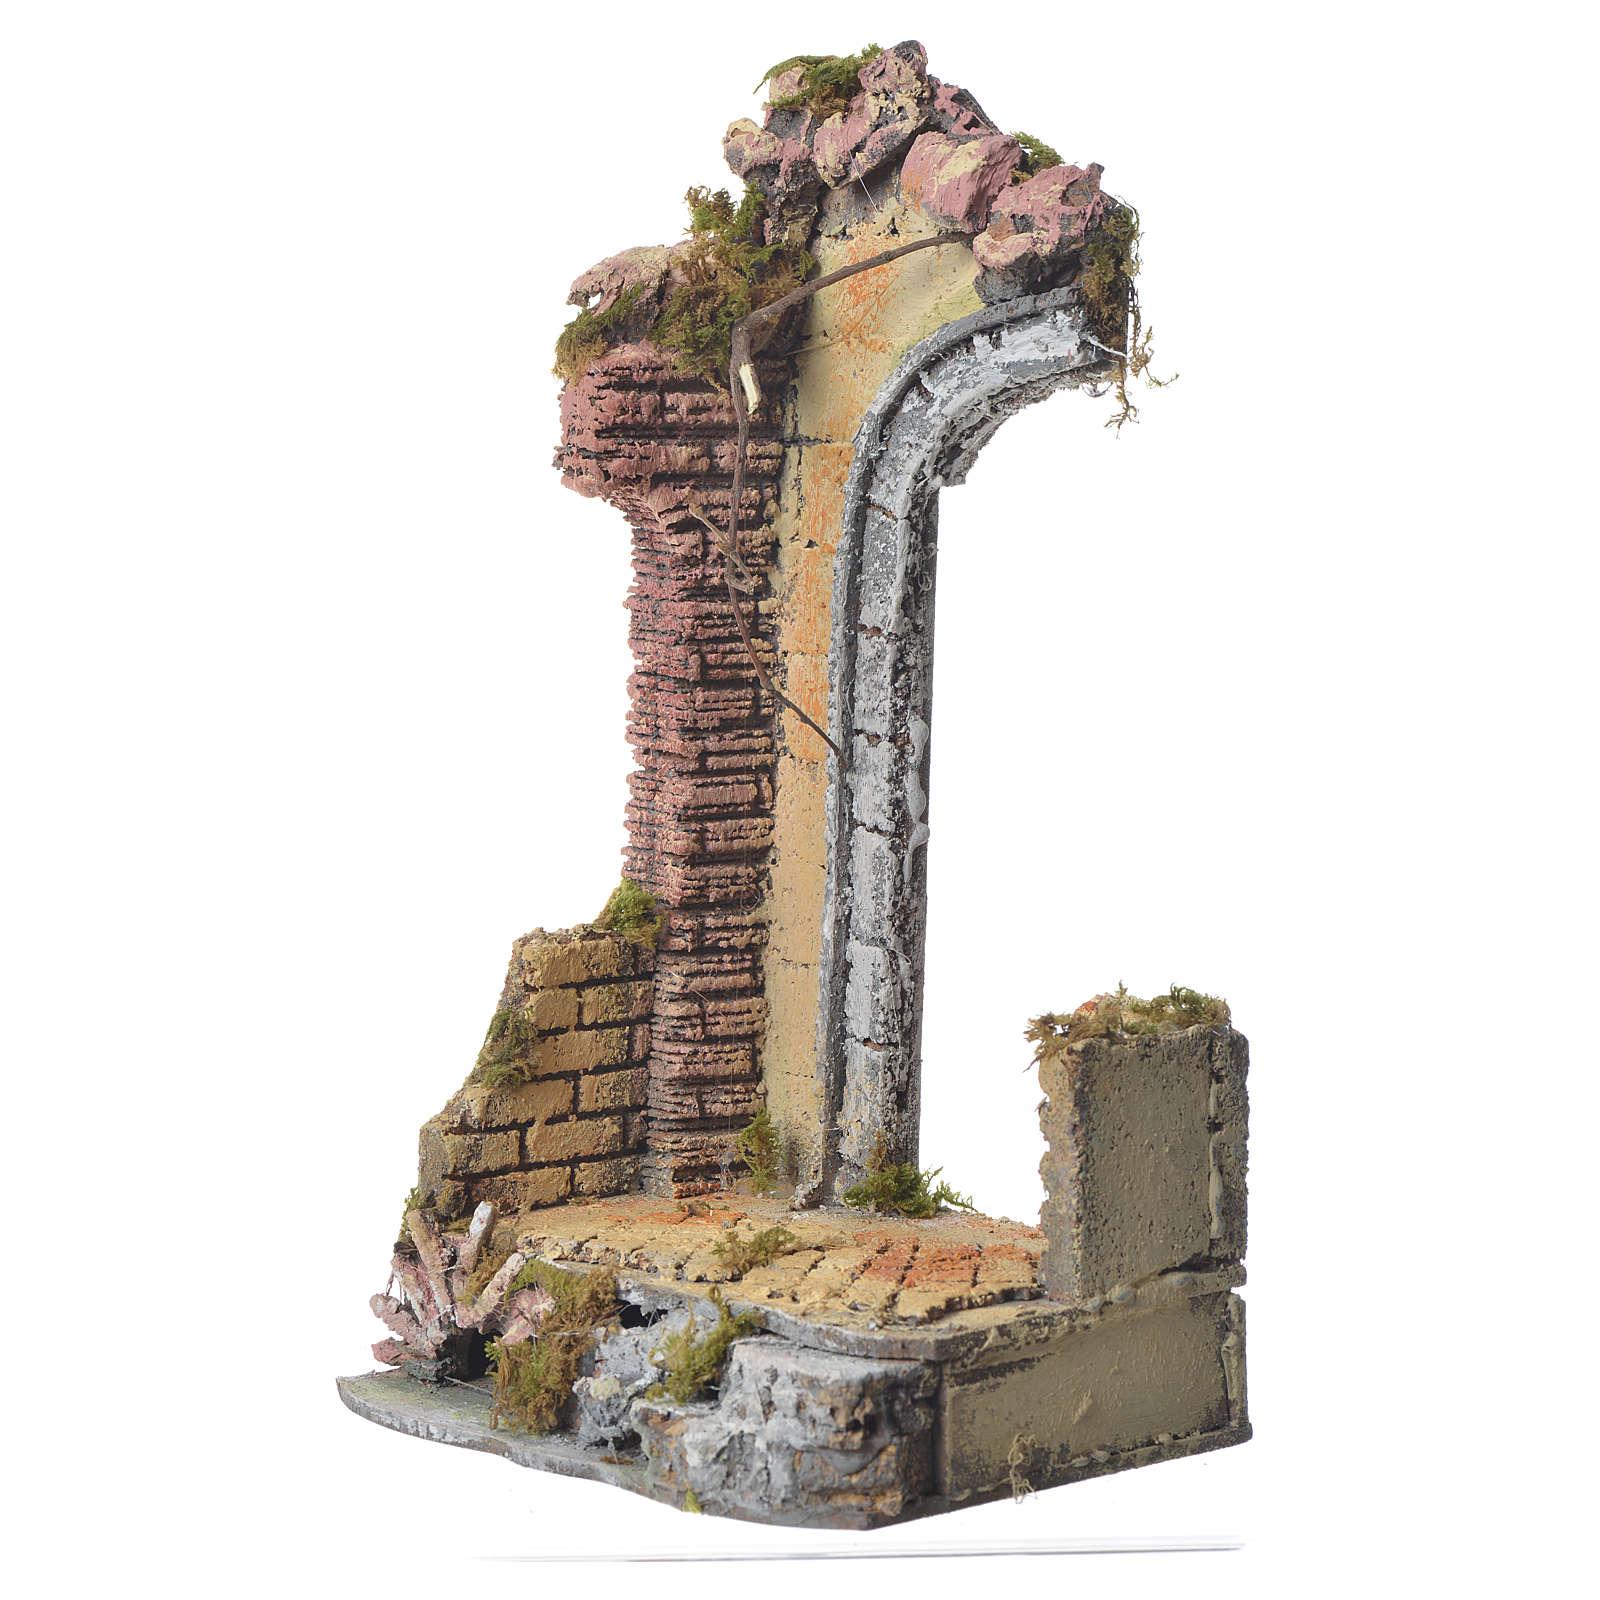 Tempio antico mezzo arco presepe 30x15x12 cm 4